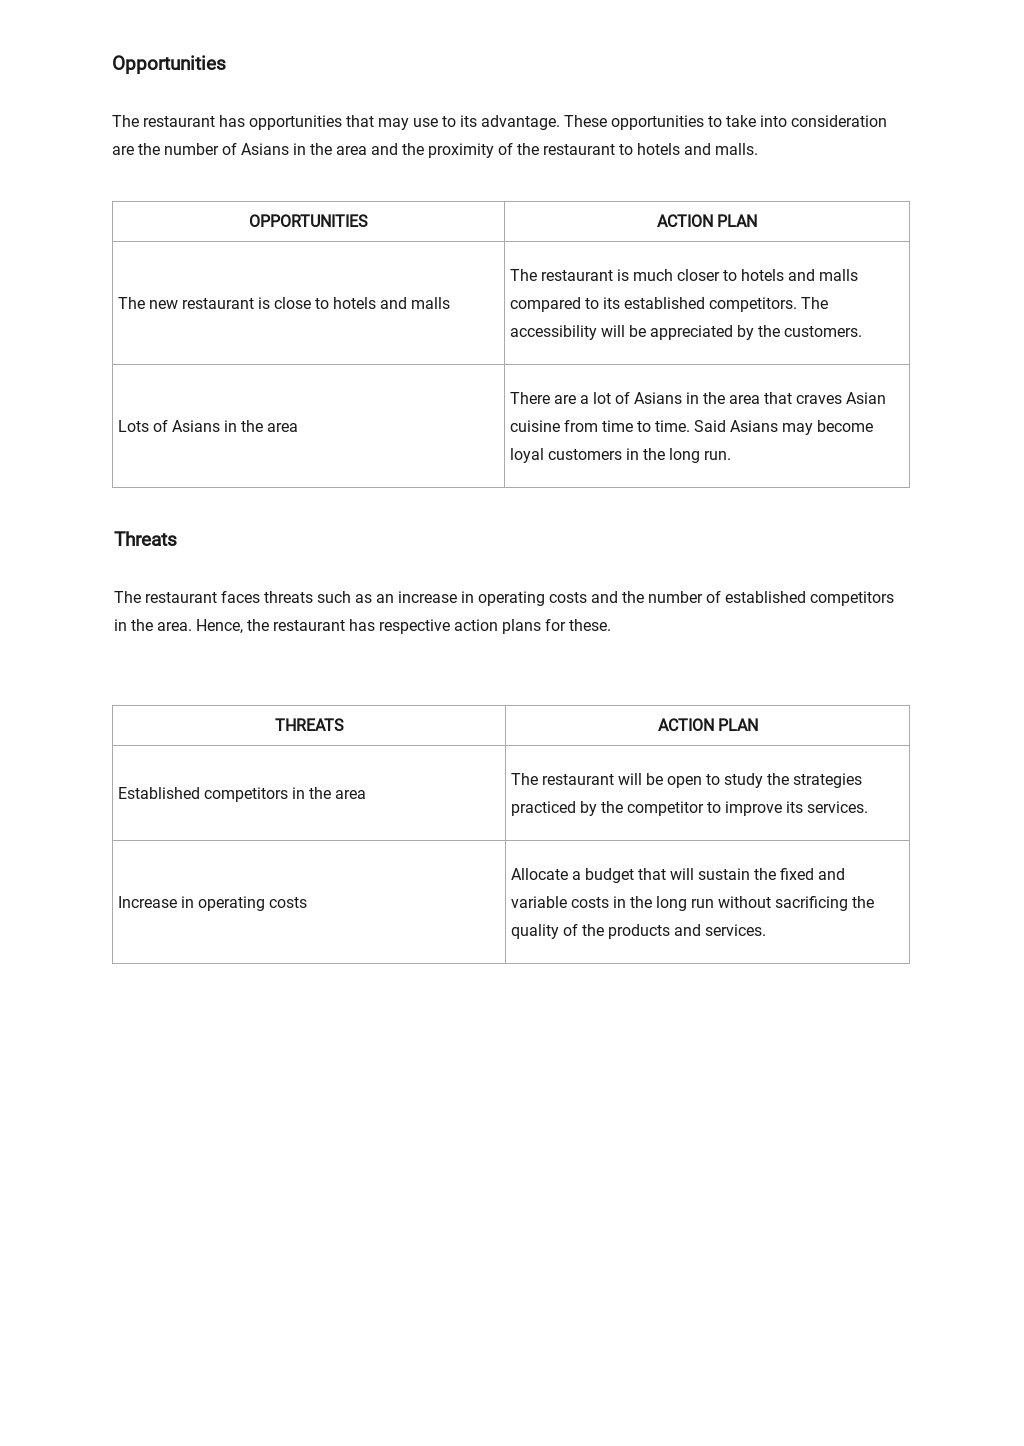 TOWS Analysis Template 2.jpe